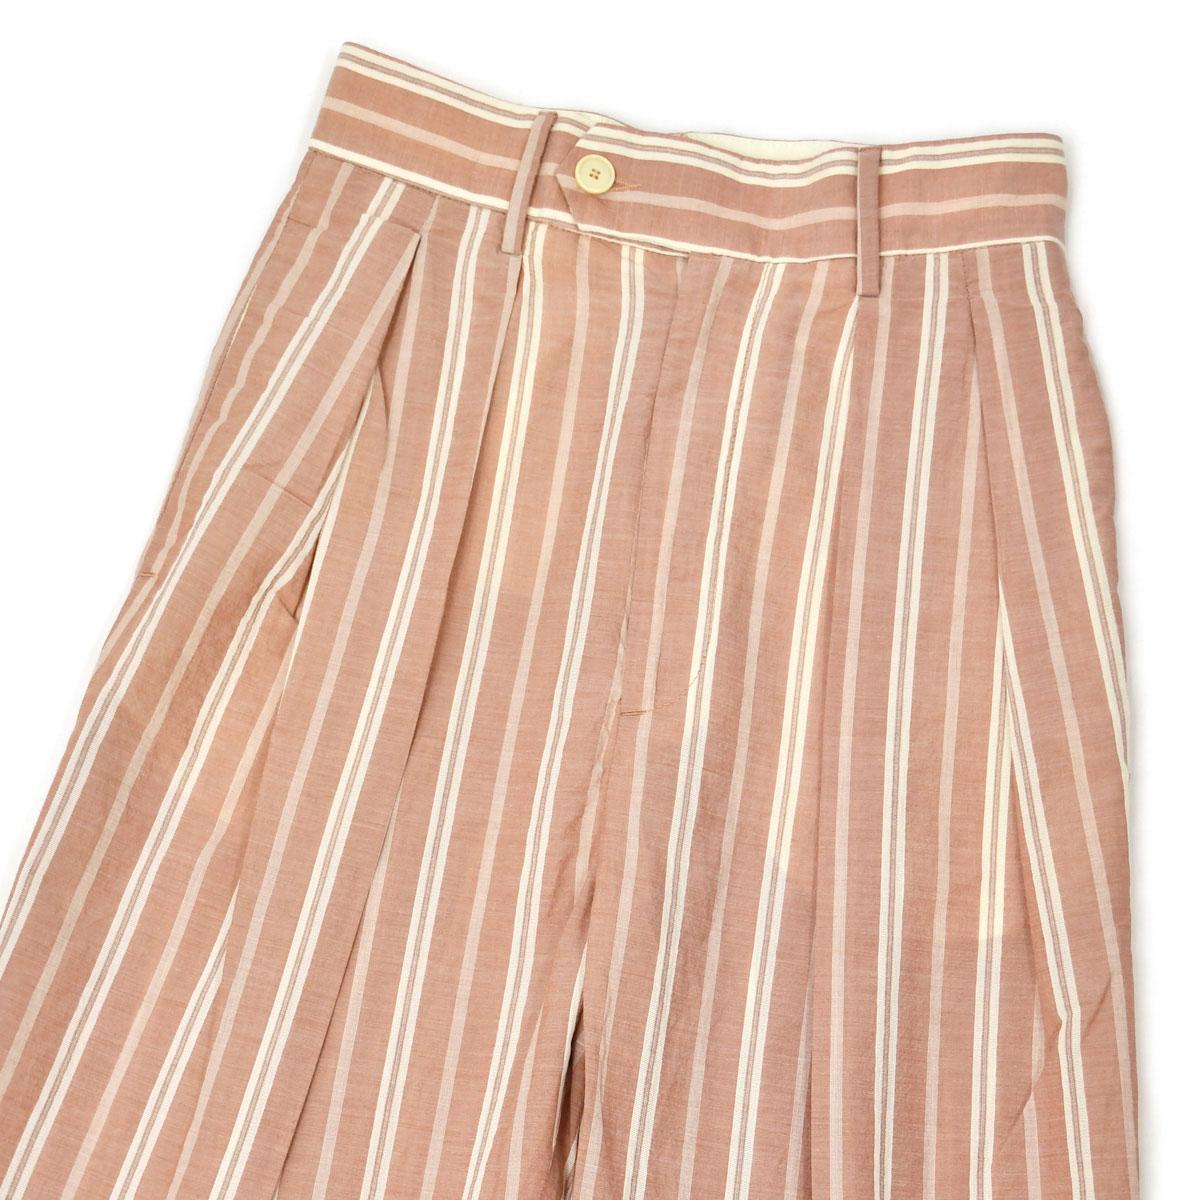 BARENA VENEZIA【バレナ ヴェネチア】ツータックストライプパンツ PAD2715 2559 Pantalone Bonnie Manita Antico コットン ピンク